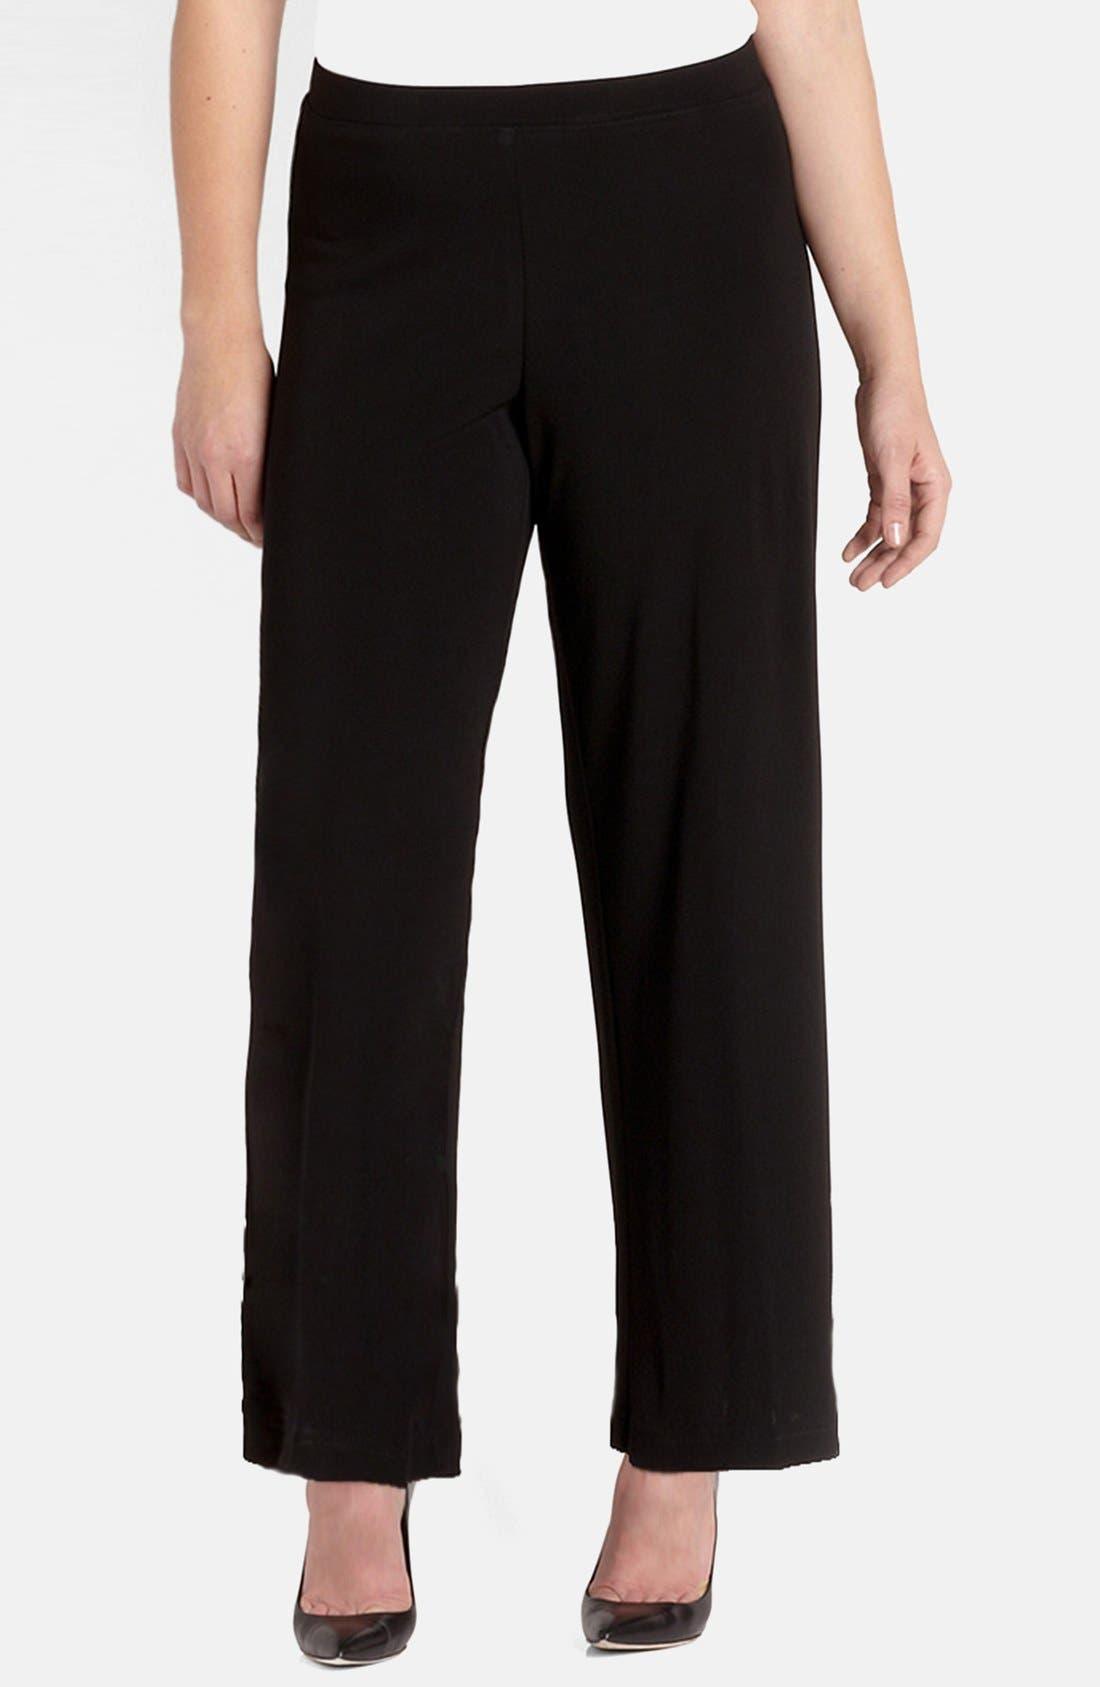 Plus Women's Karen Kane Straight Leg Matte Jersey Pants